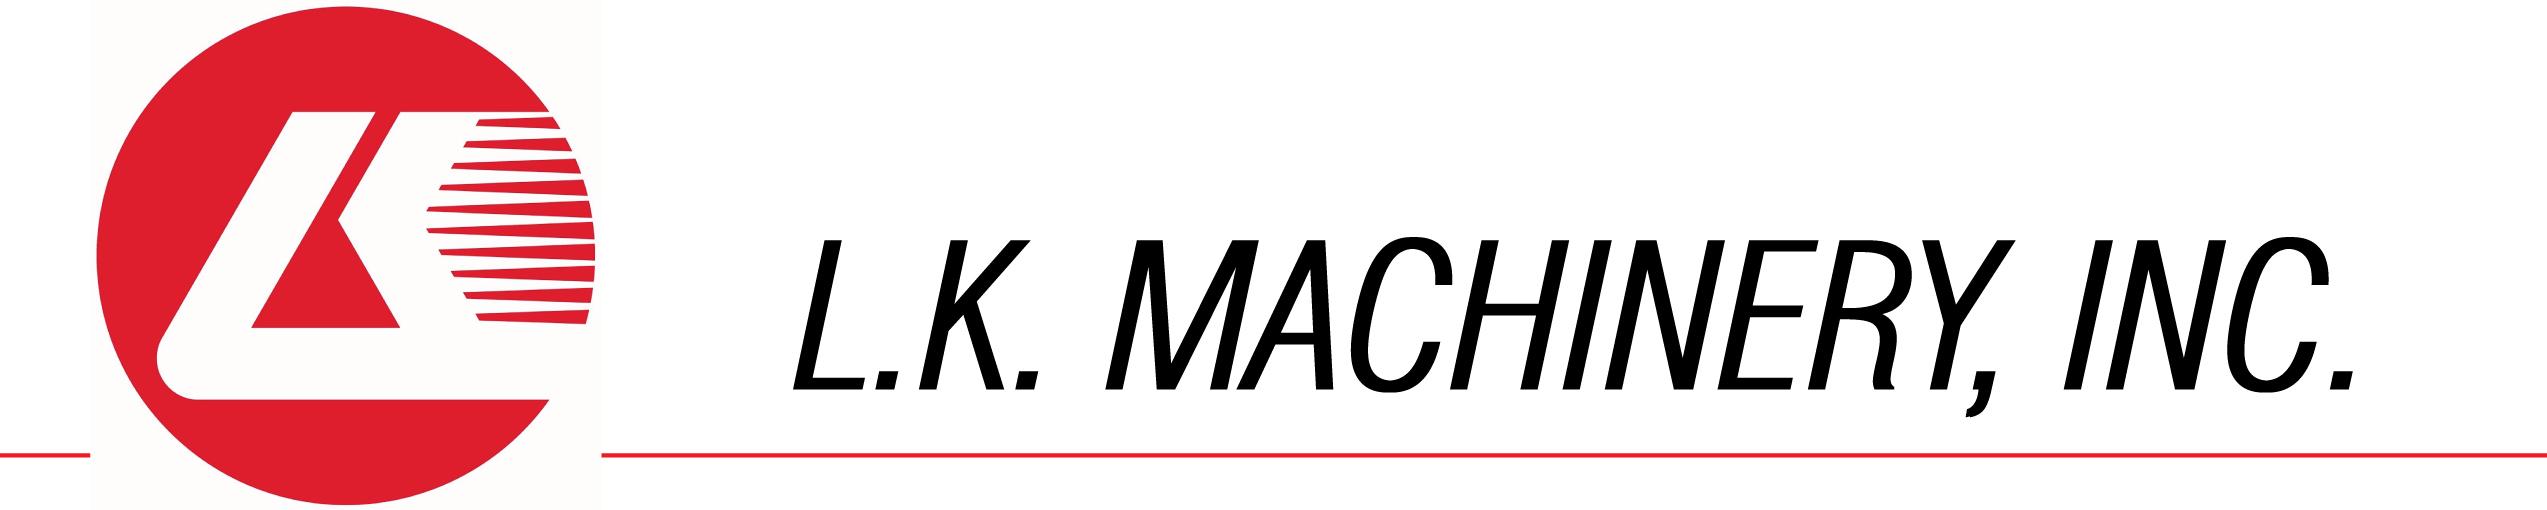 LK Machinery